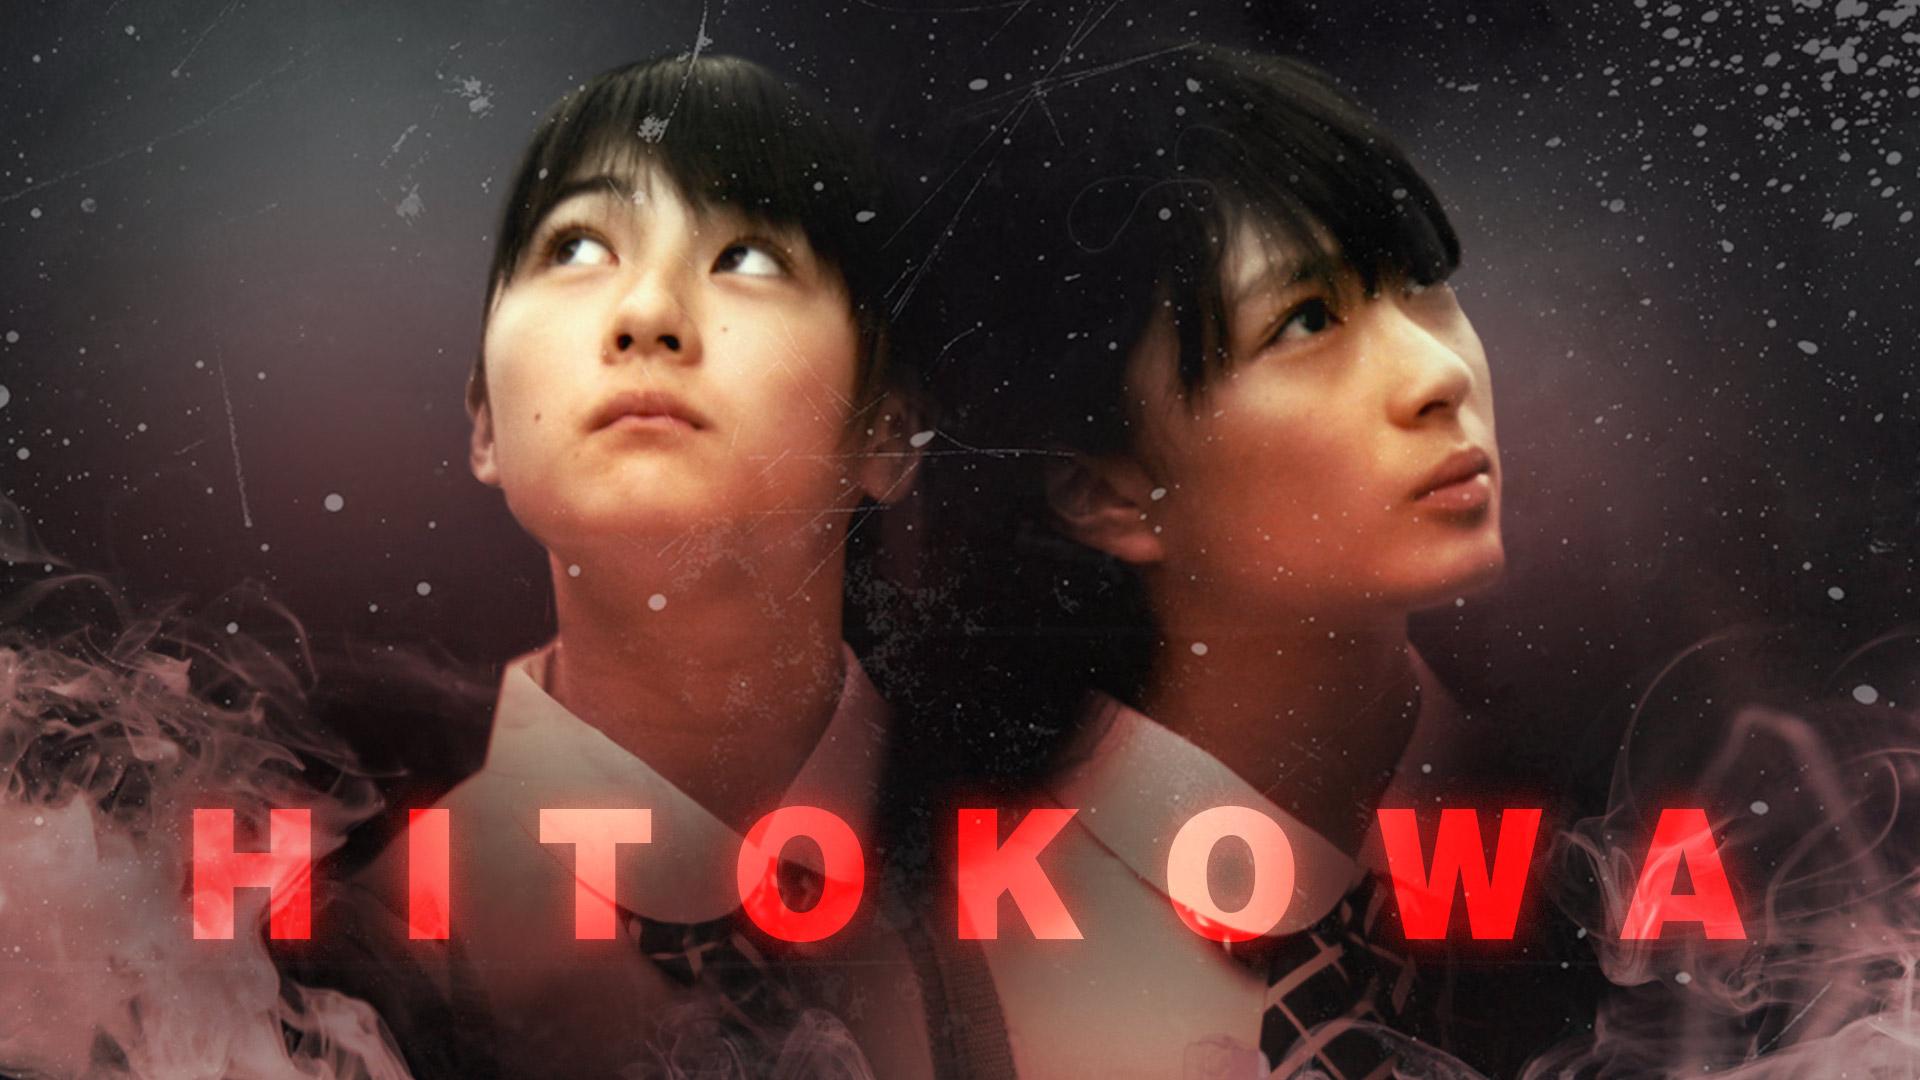 Hitokowa: Evil Comes Home